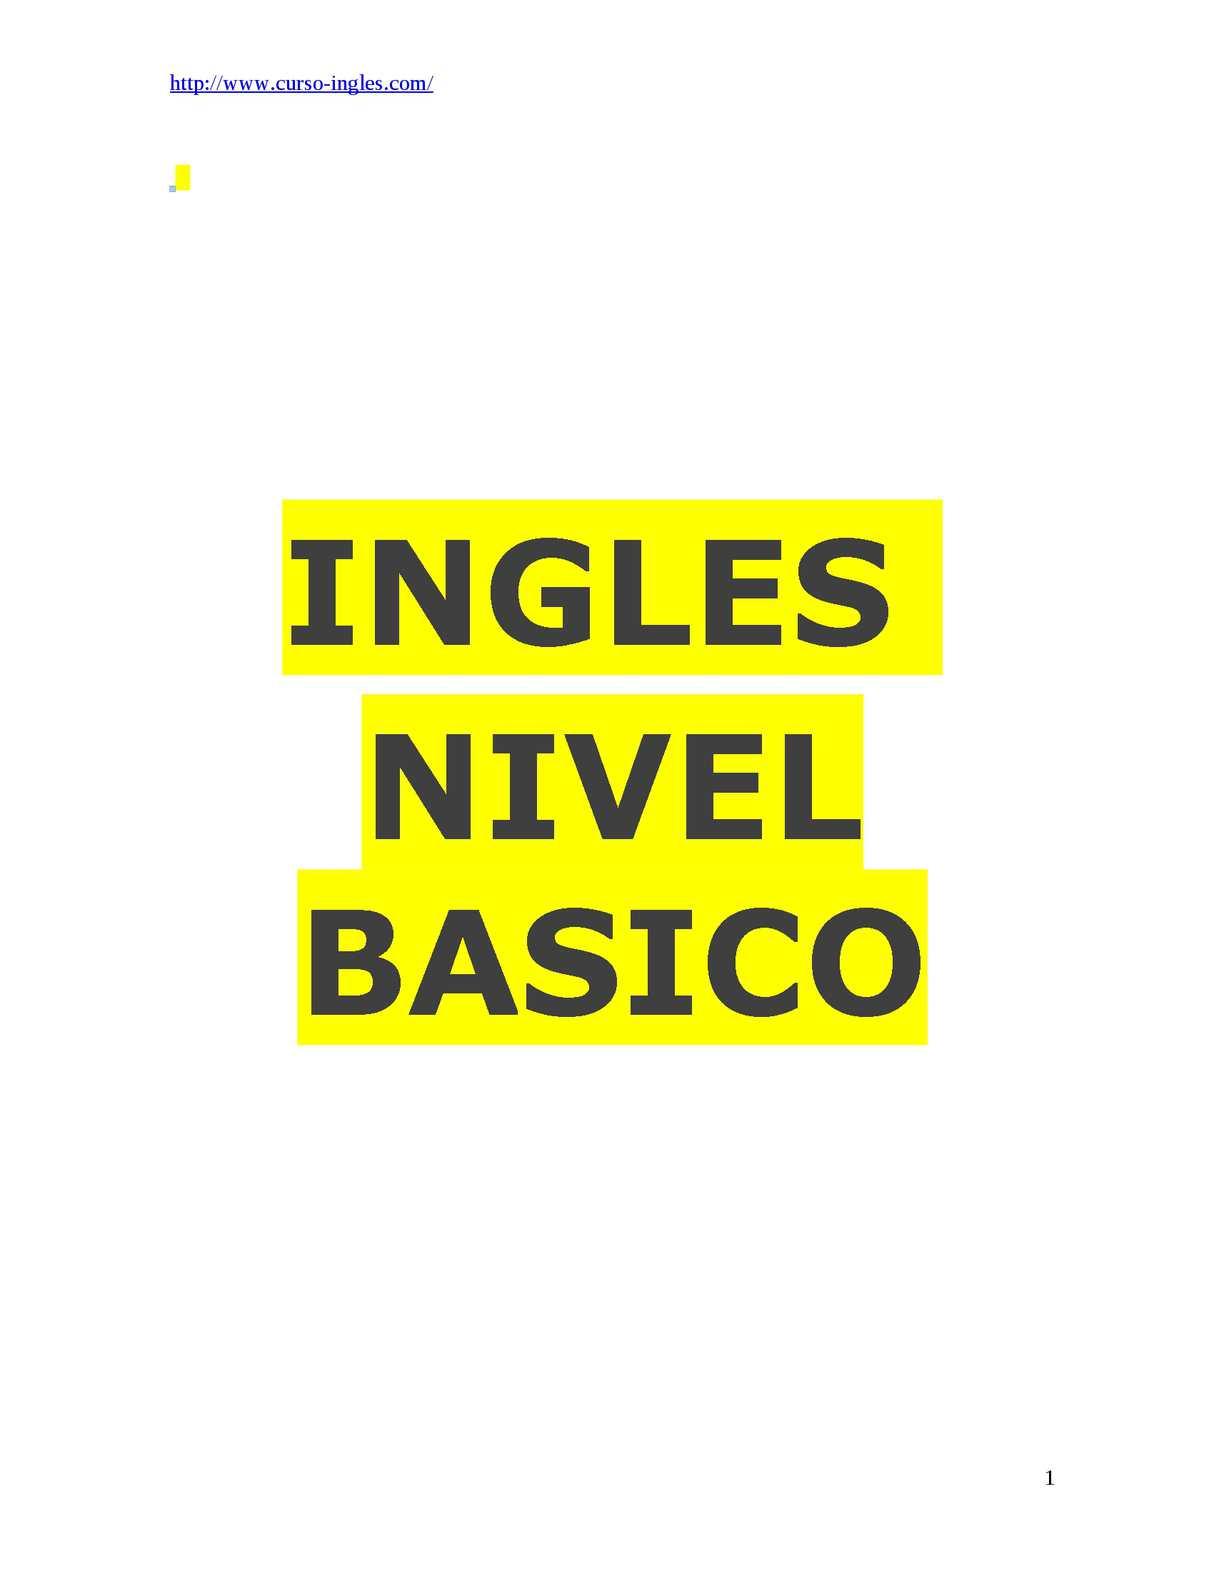 Calaméo - Inglés Nivel Básico